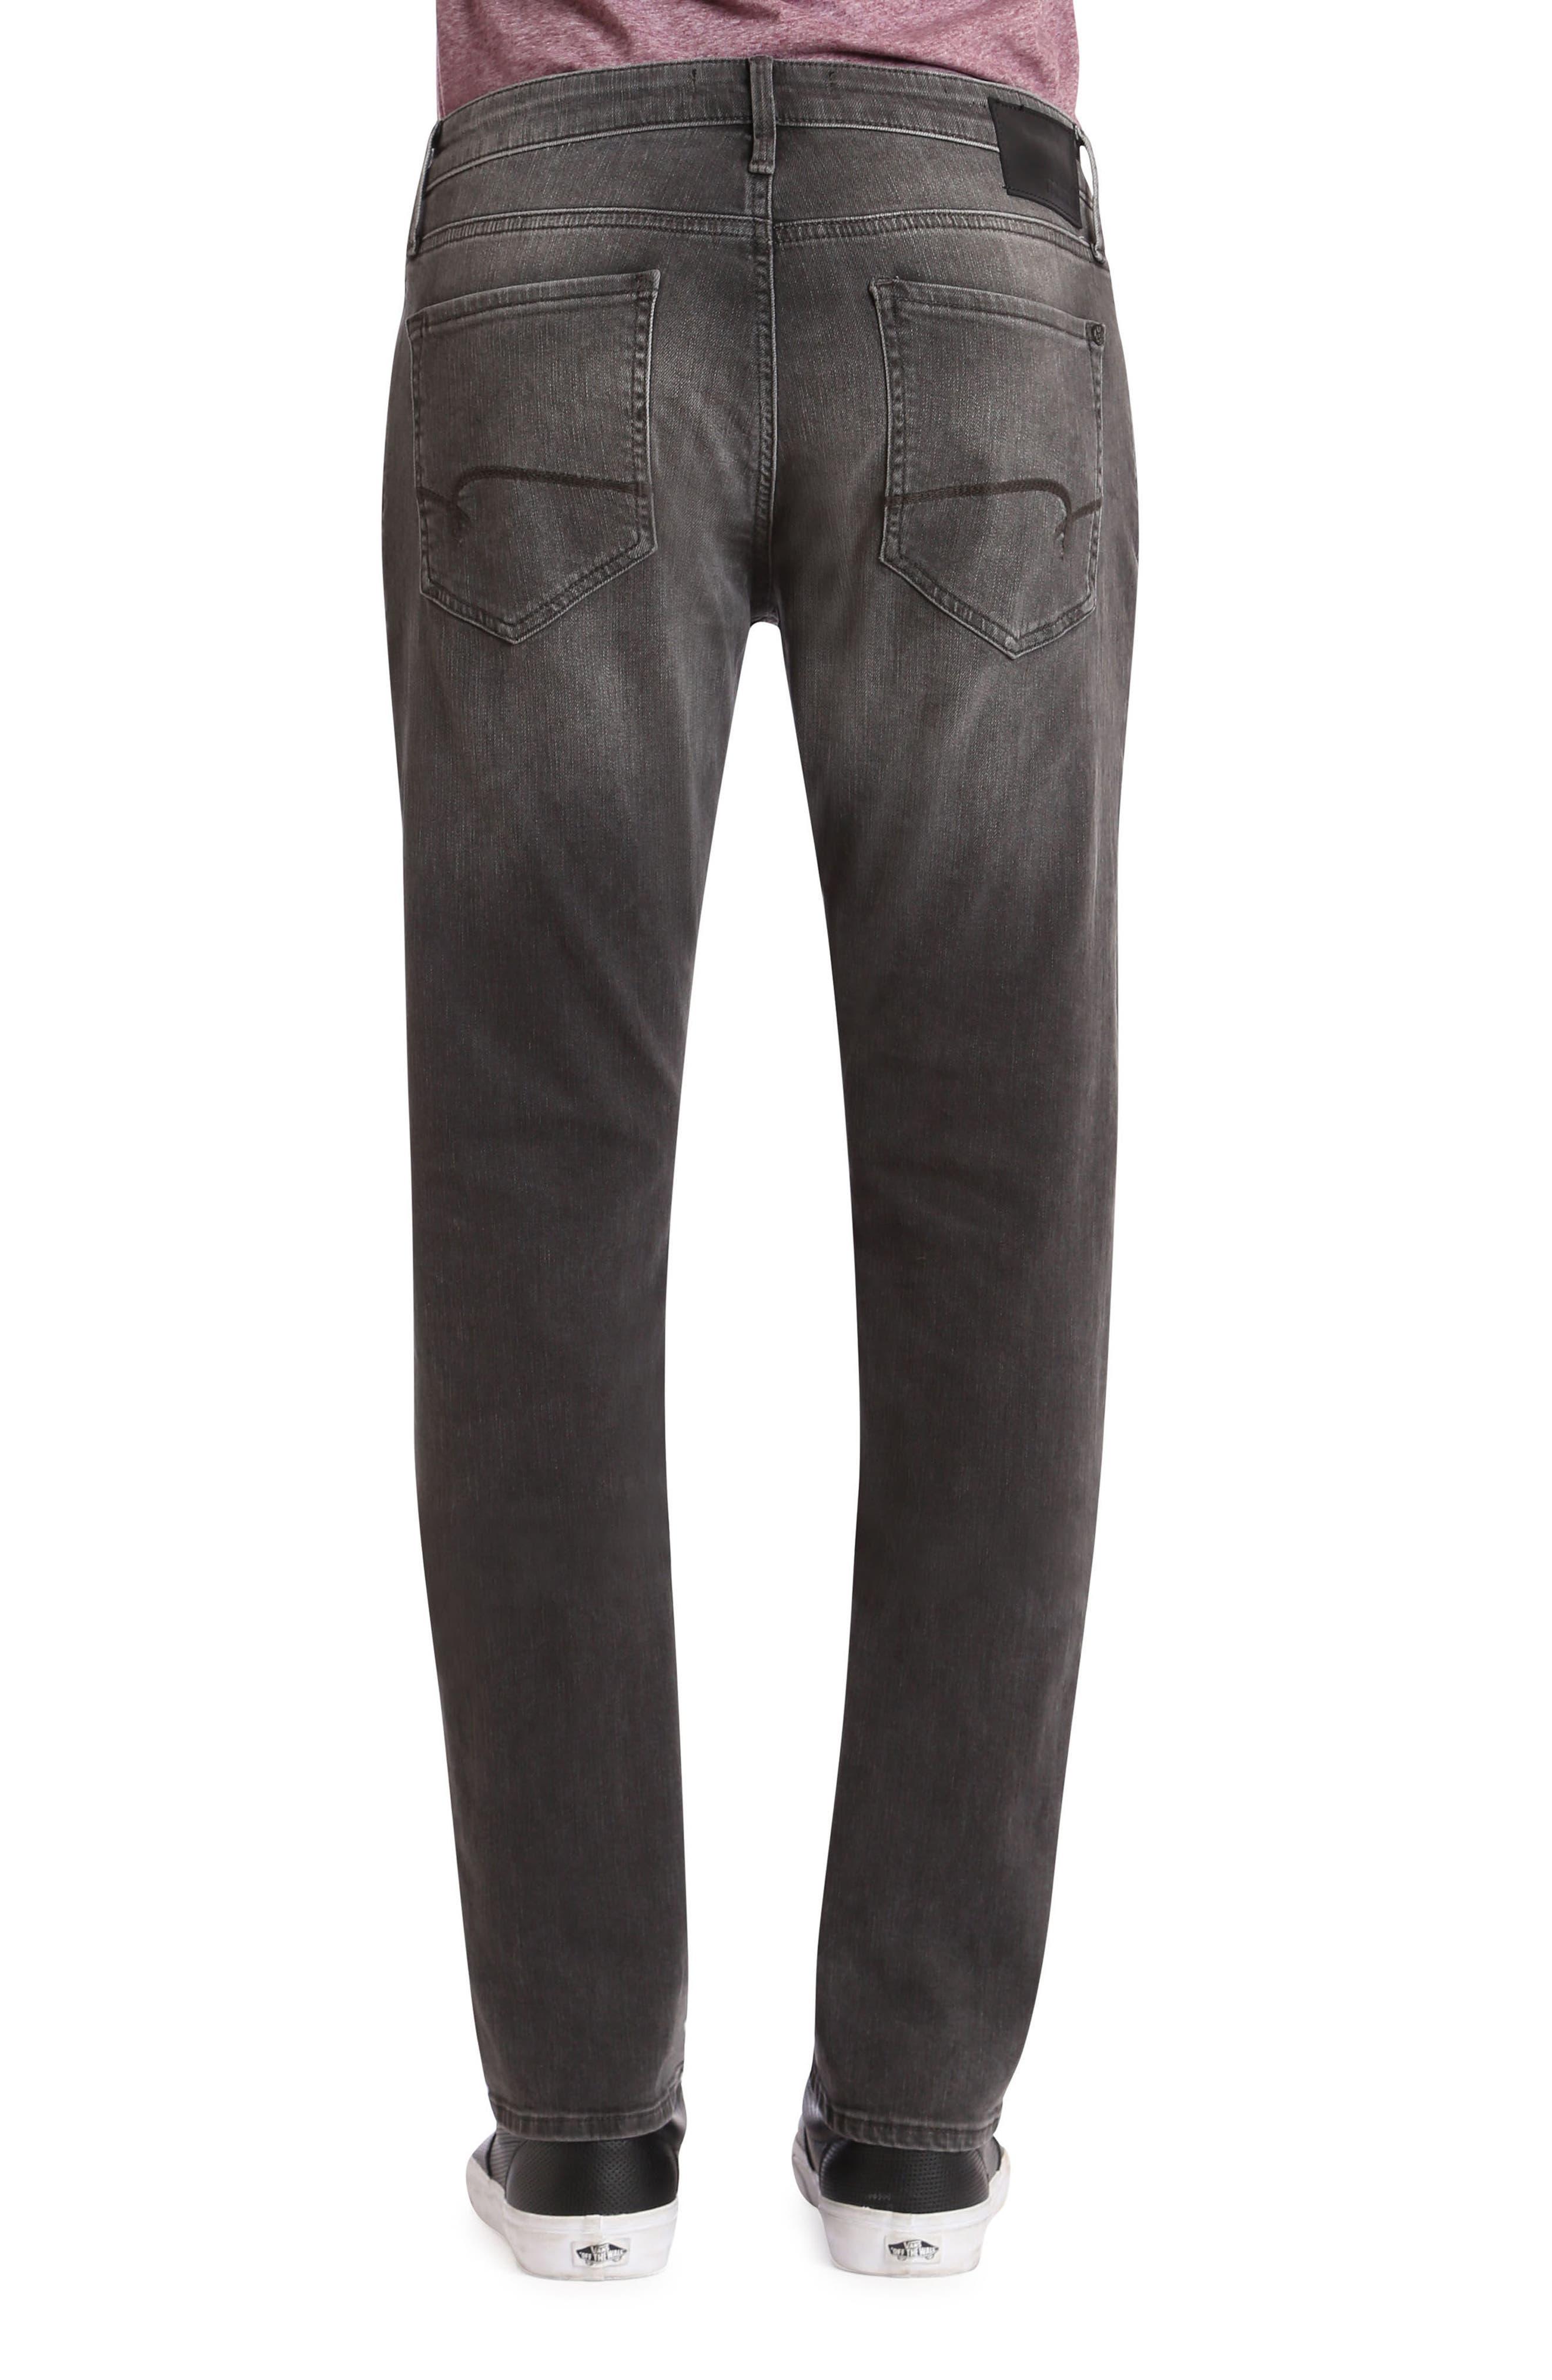 Jake Slim Fit Jeans,                             Alternate thumbnail 2, color,                             020